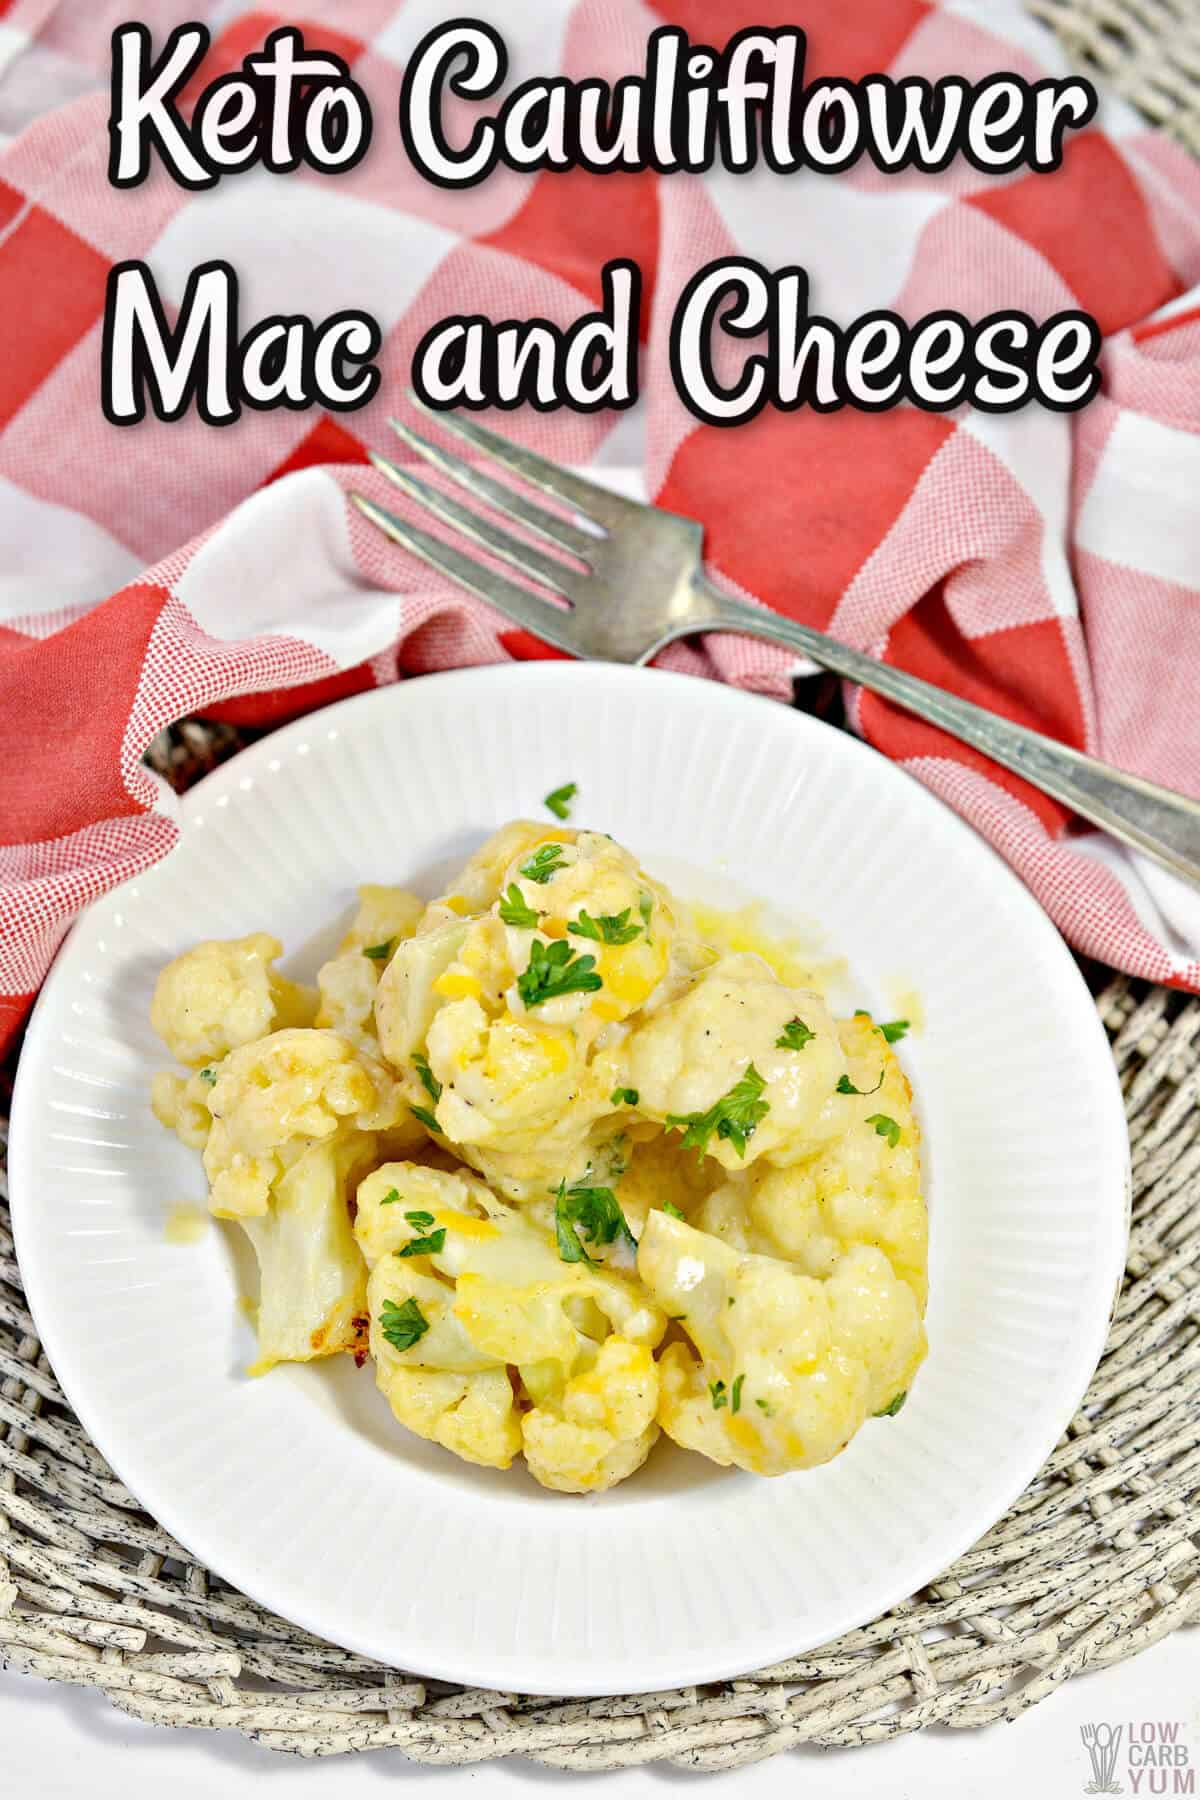 keto cauliflower mac and cheese cover image